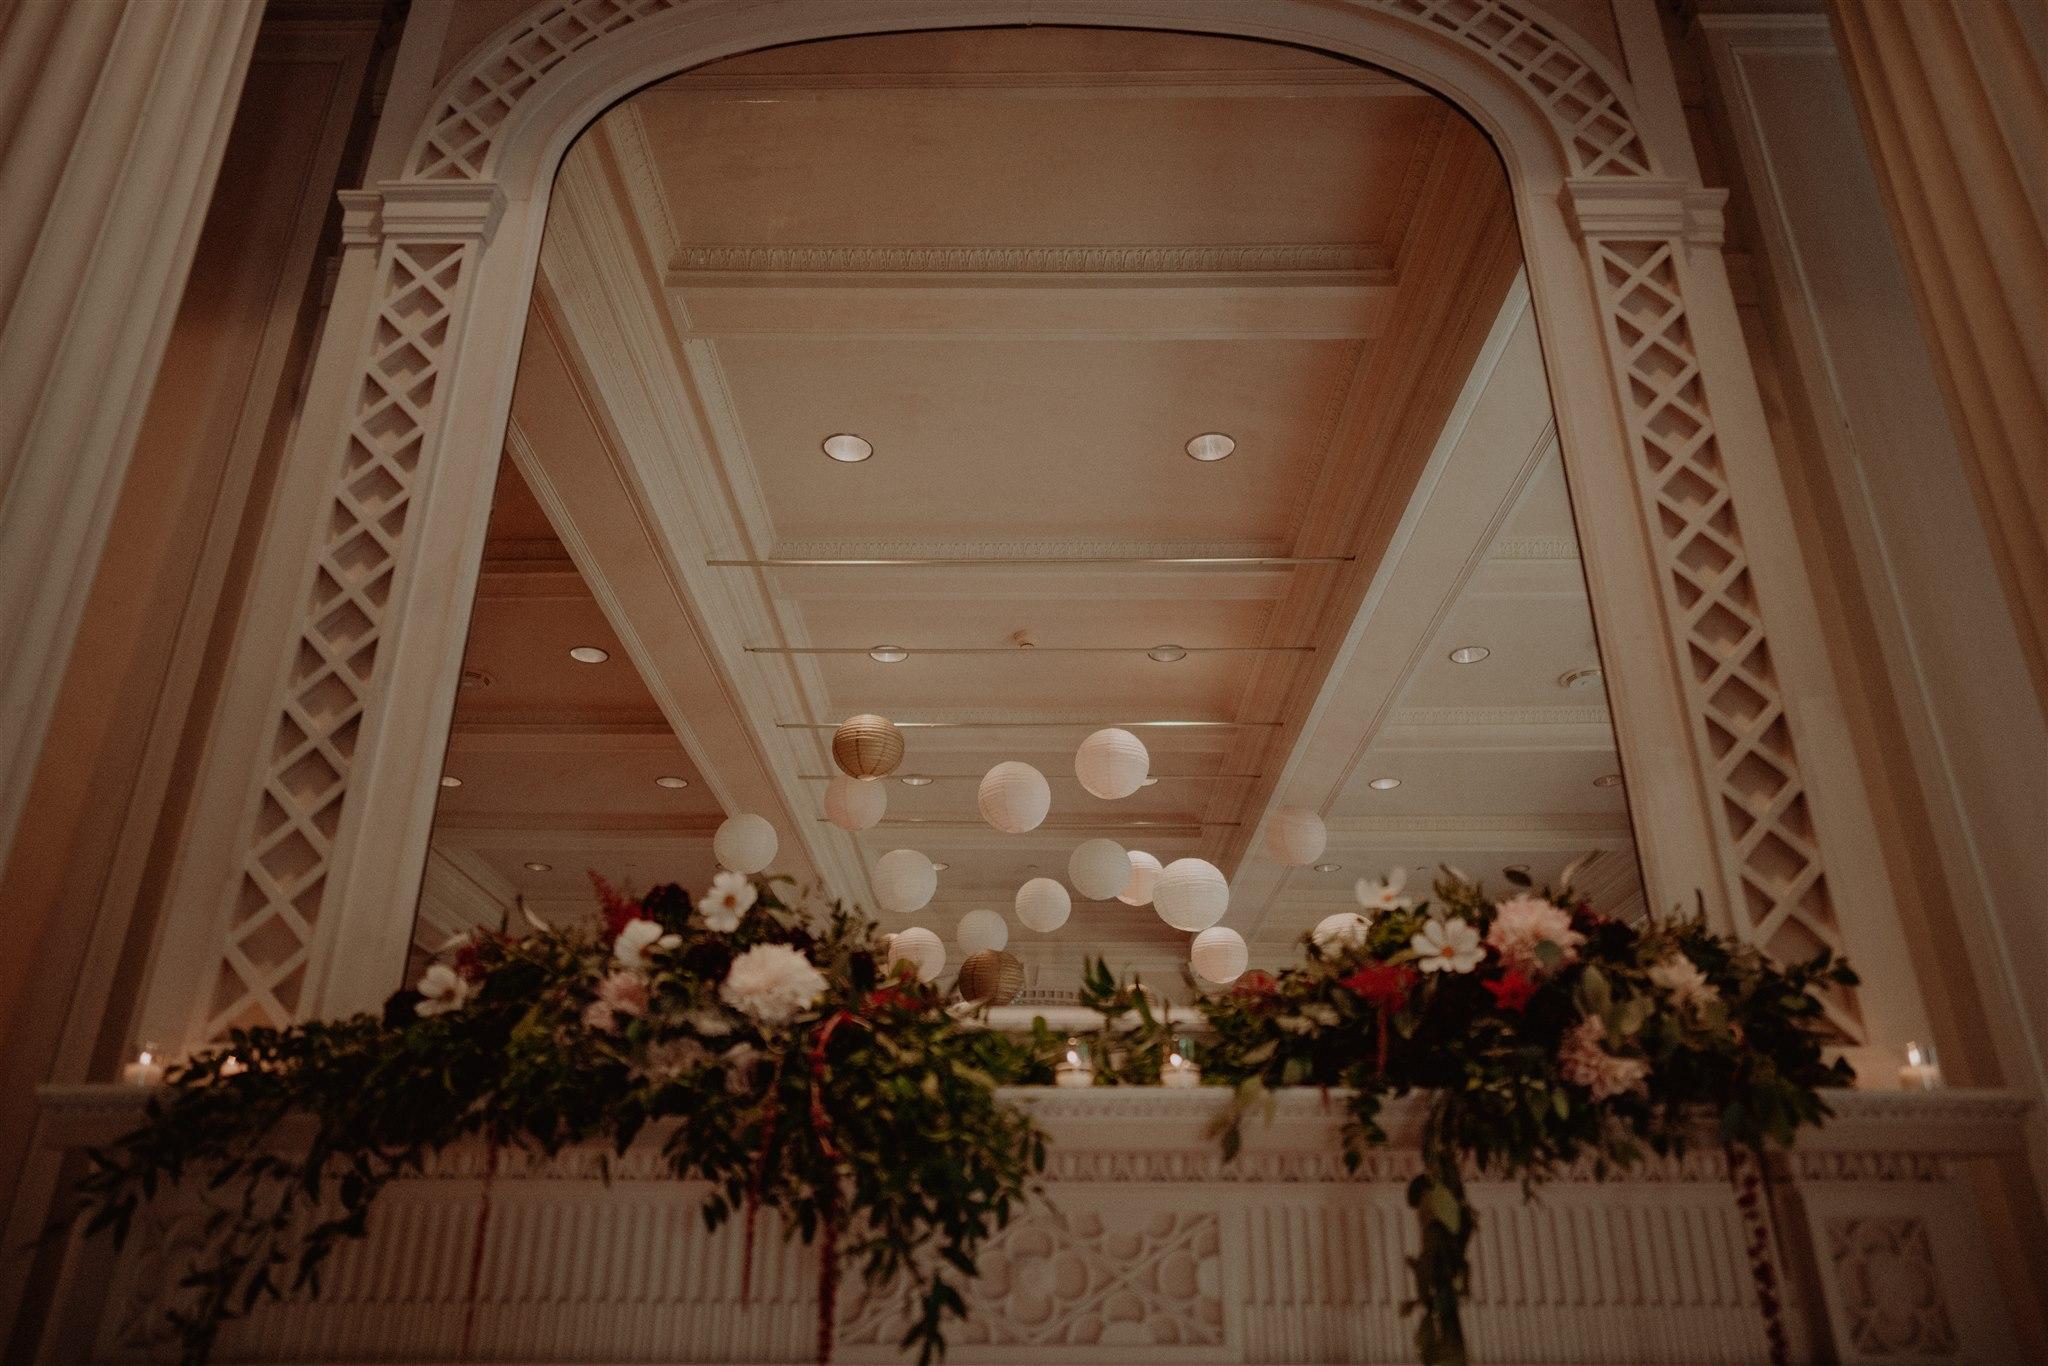 Chellise_Michael_Photography_Hudson_Valley_Wedding_Photographer_Otesaga_Hotel-5005.jpg